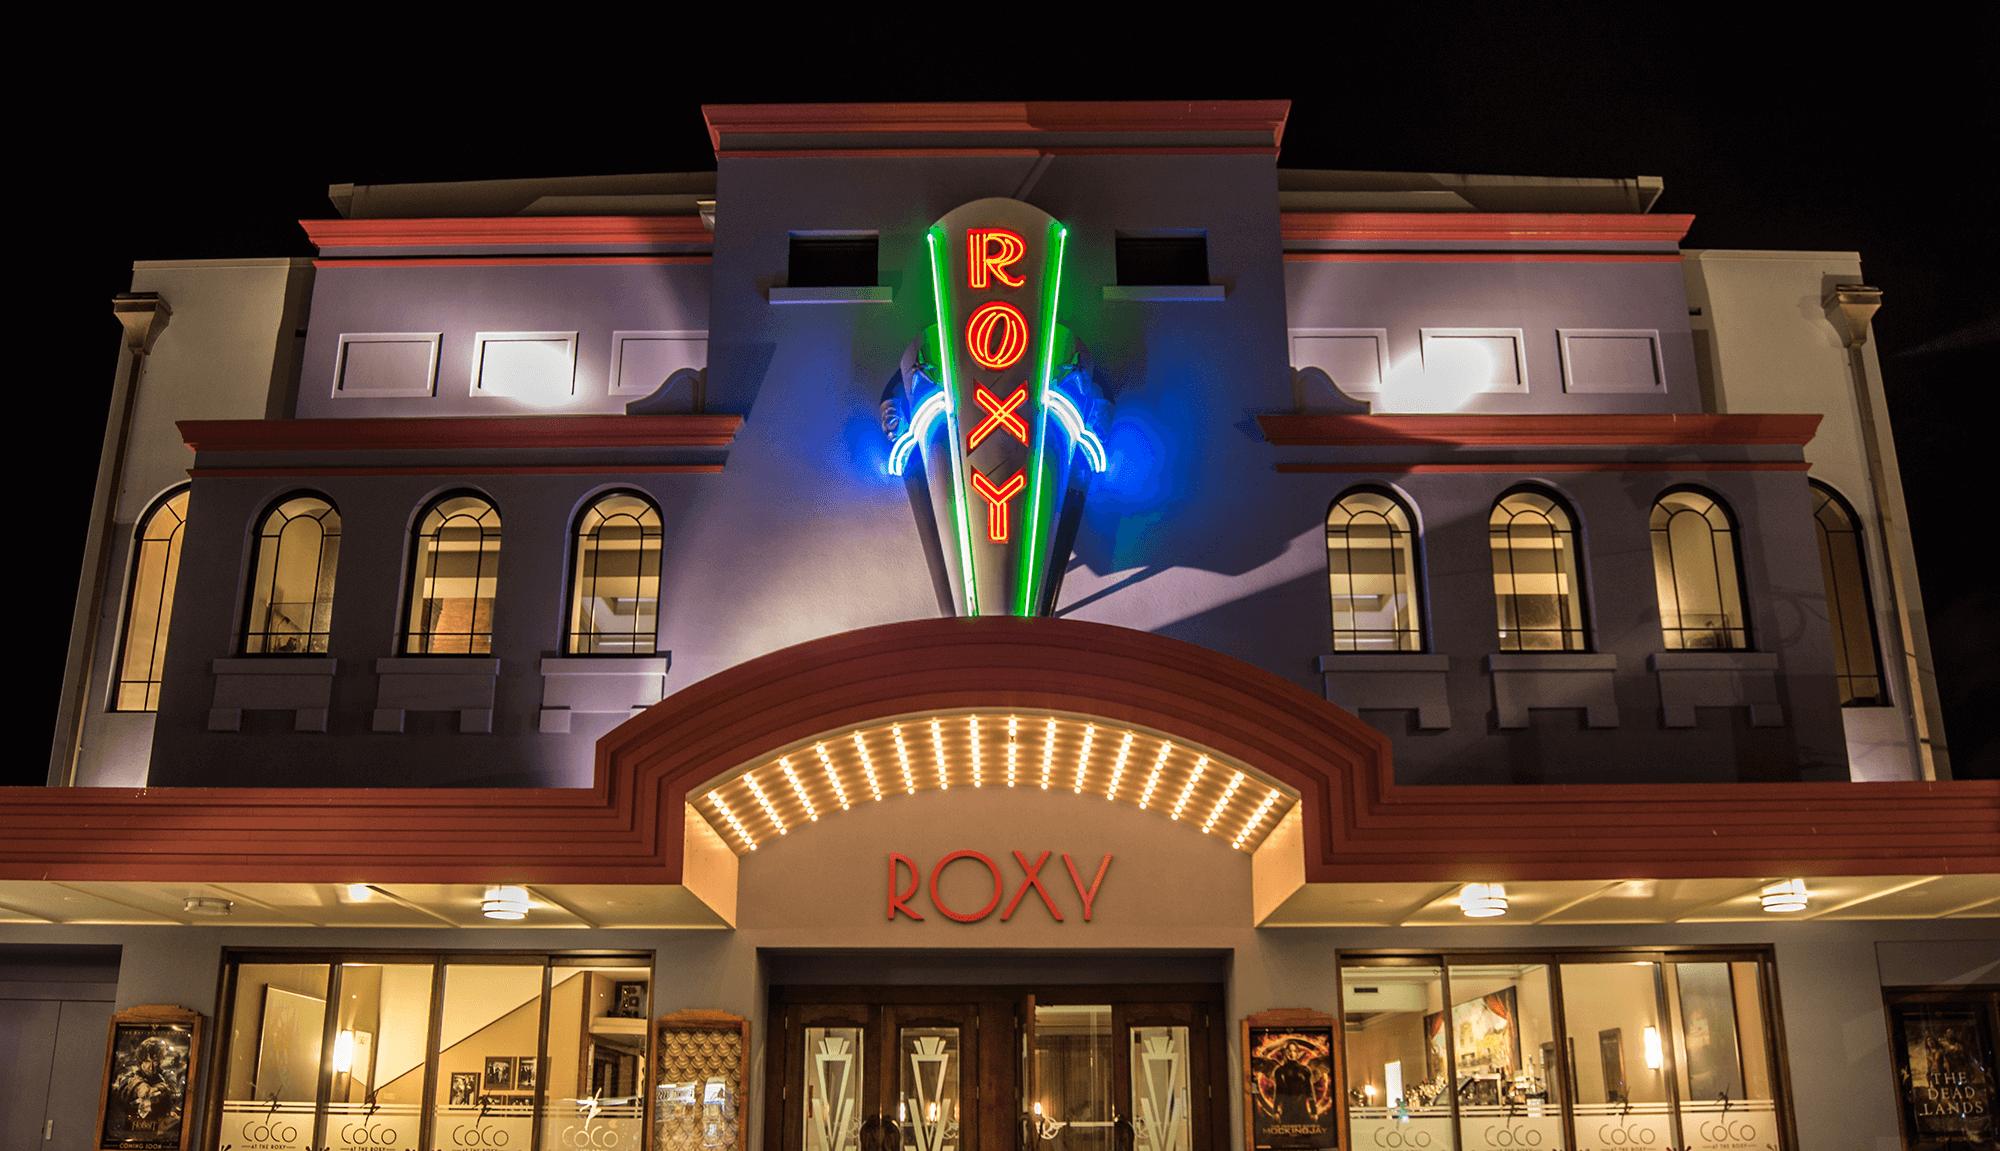 Roxy Cinema - 5 Park Road, Miramar, Wellington